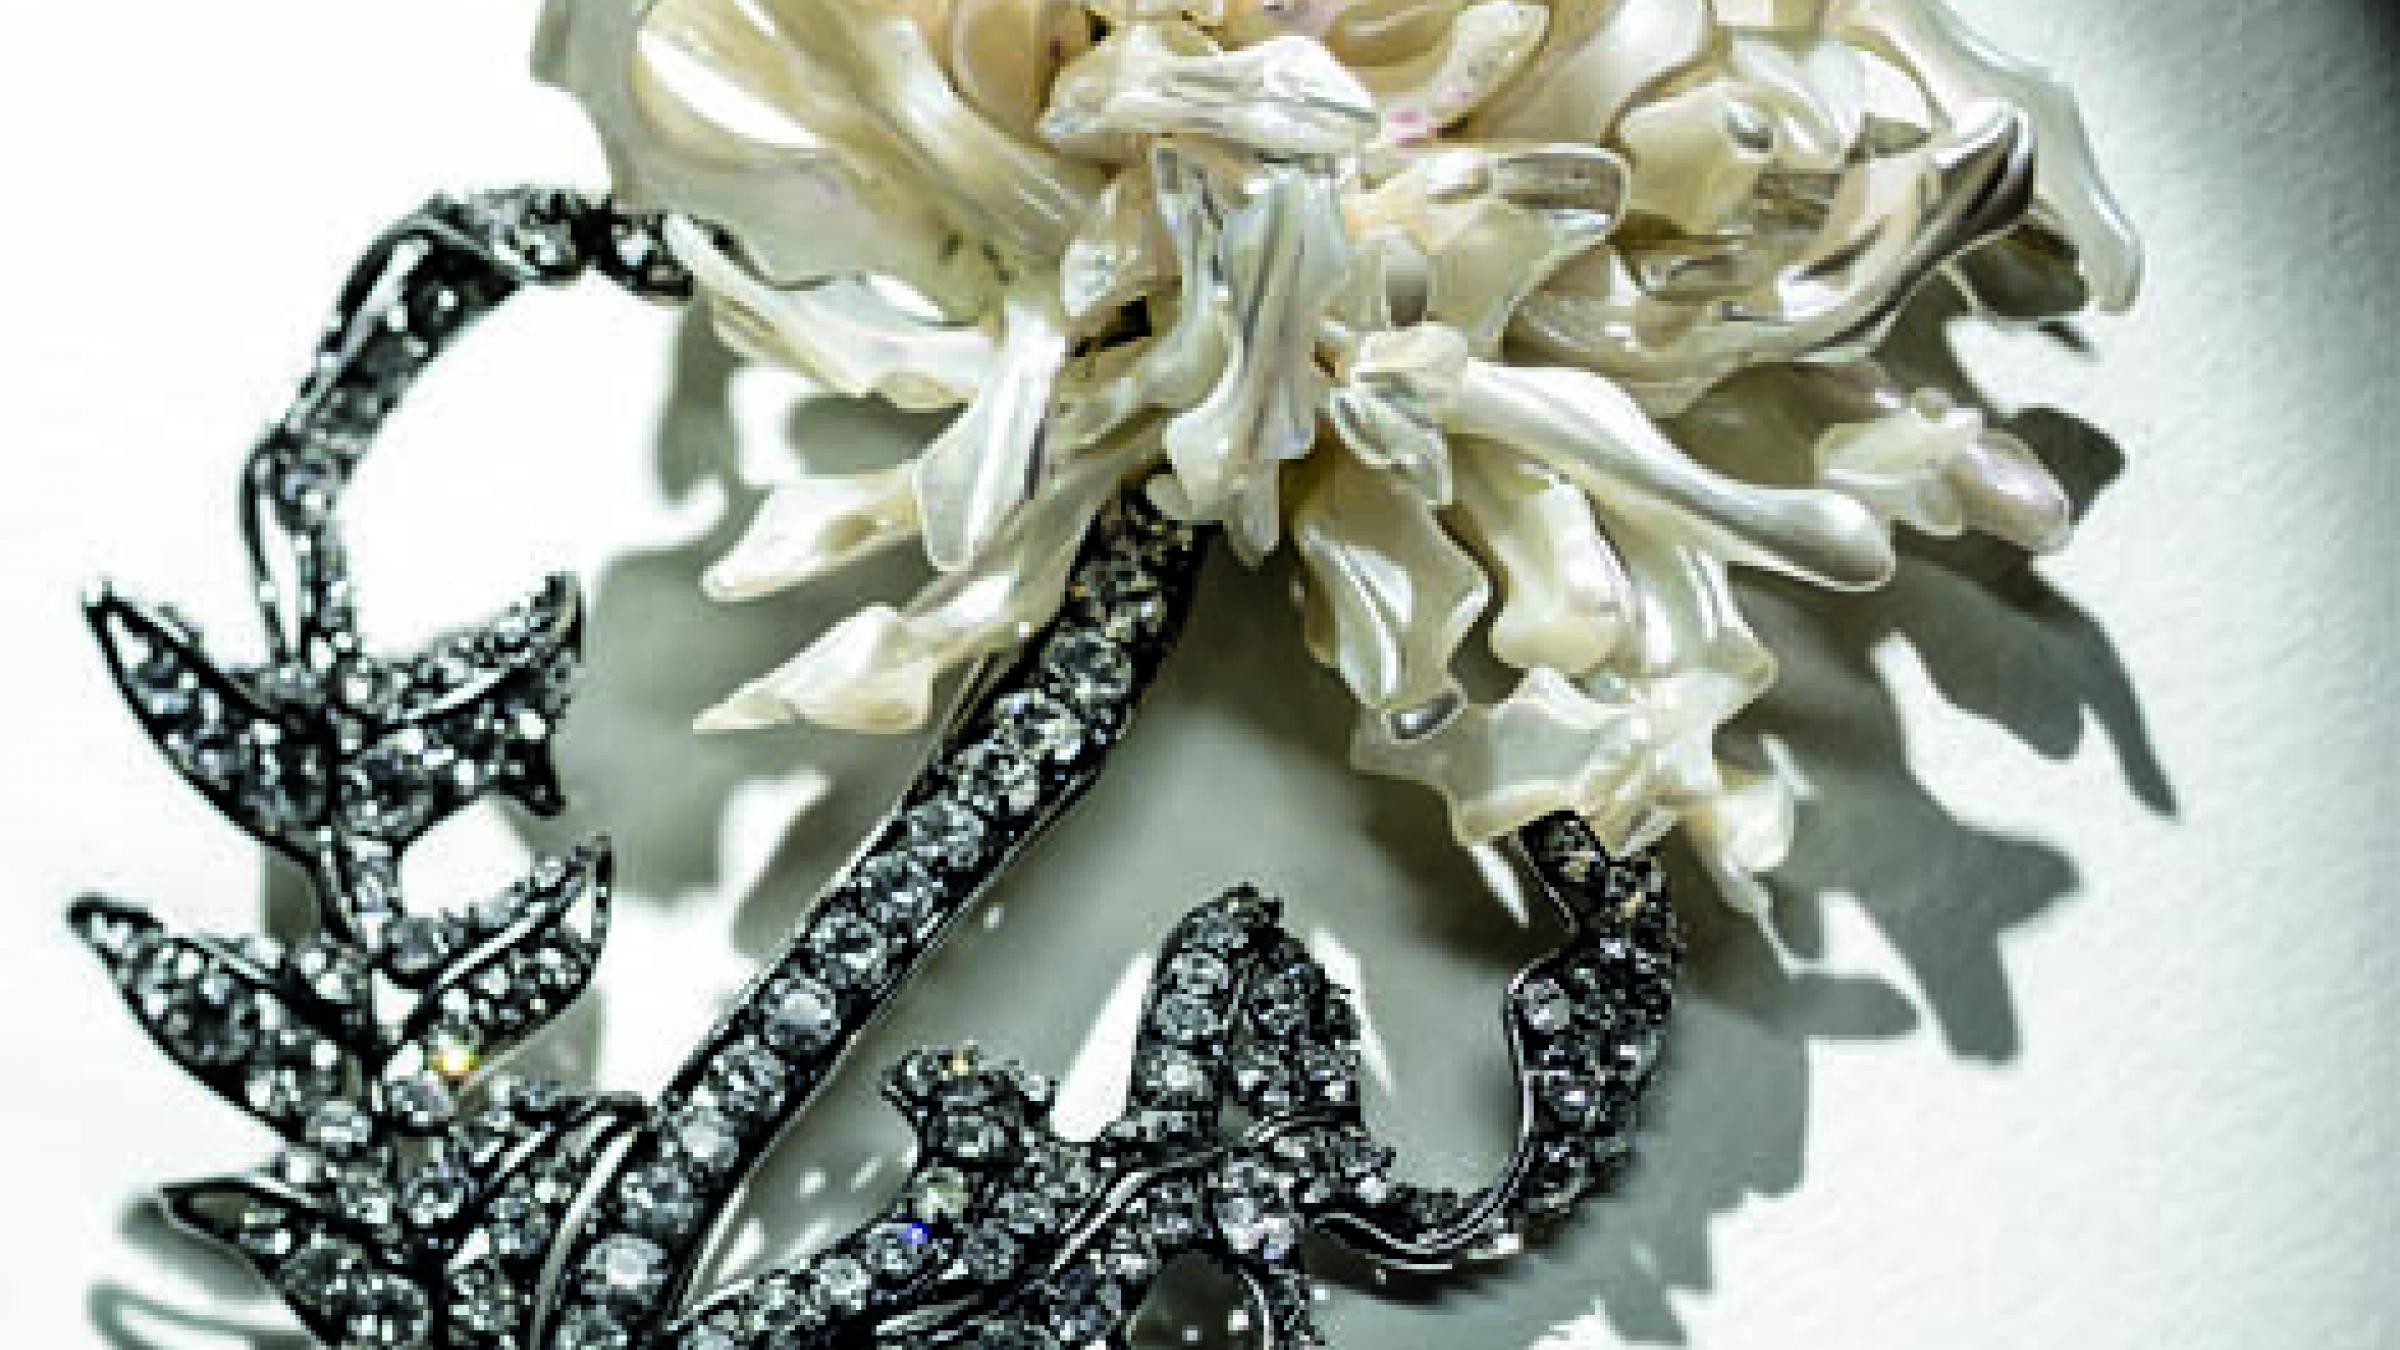 Iradj Moini, circa 1994,Floral brooch. Mother-of-pearl, Swarovski Austrian crystals. Gunmetal plated